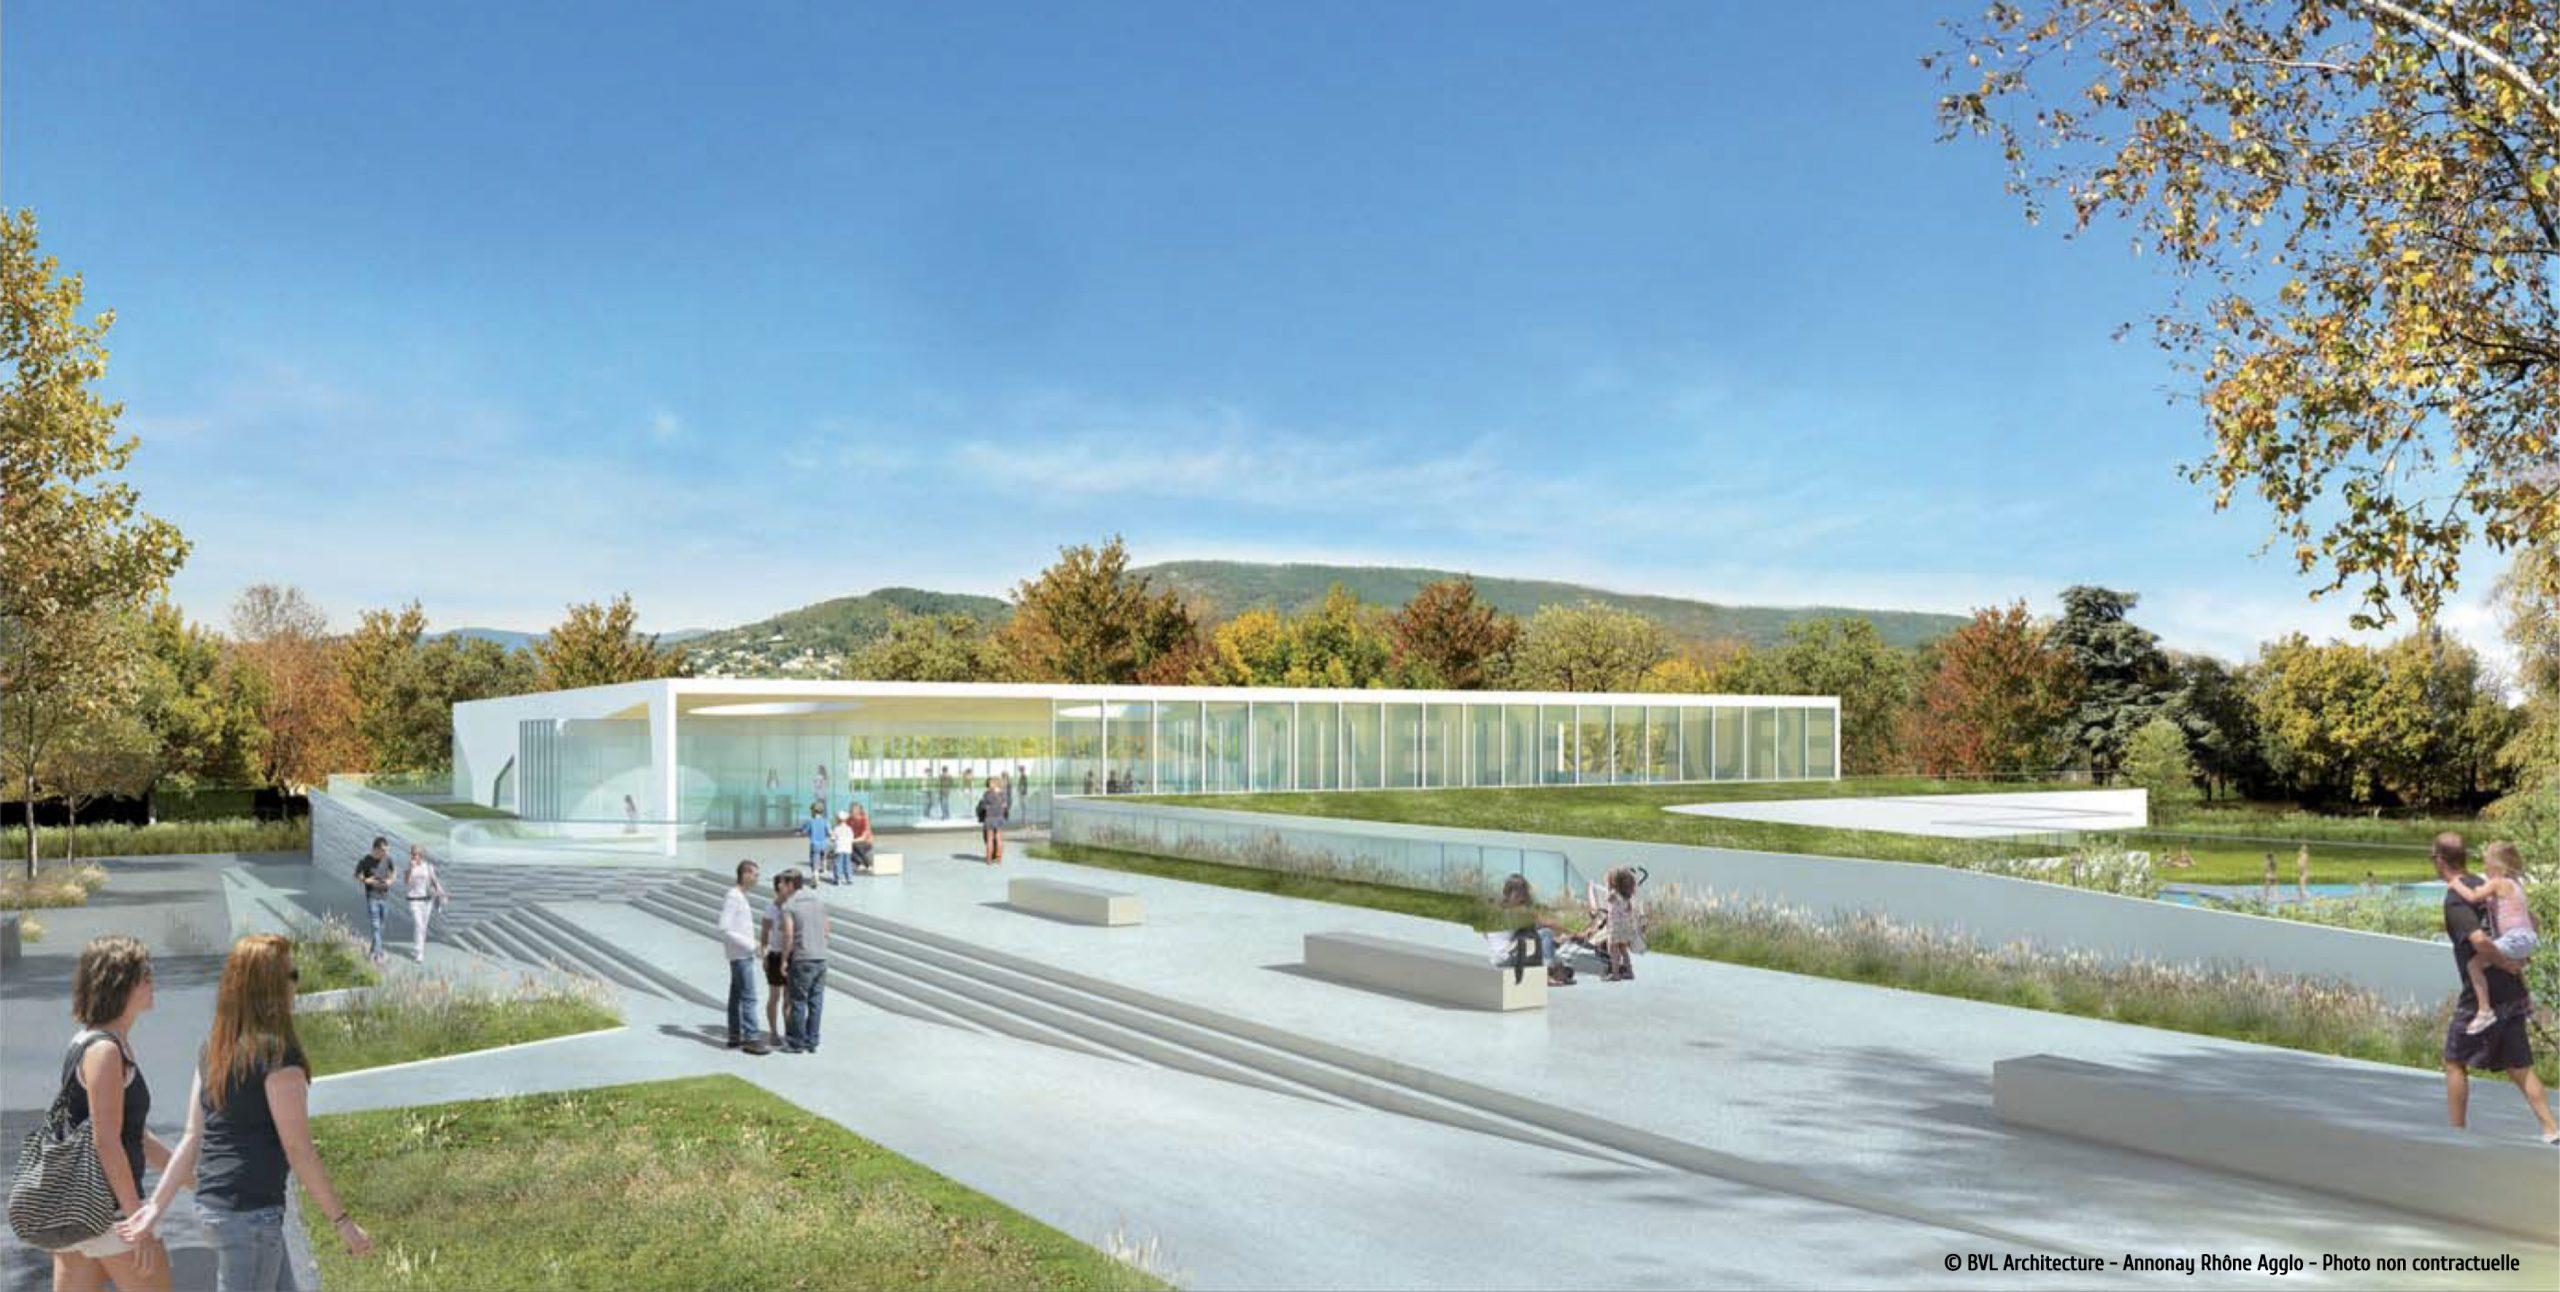 Plongez Dans Votre Futur Centre Aquatique Aquavaure ... concernant Piscine Annonay